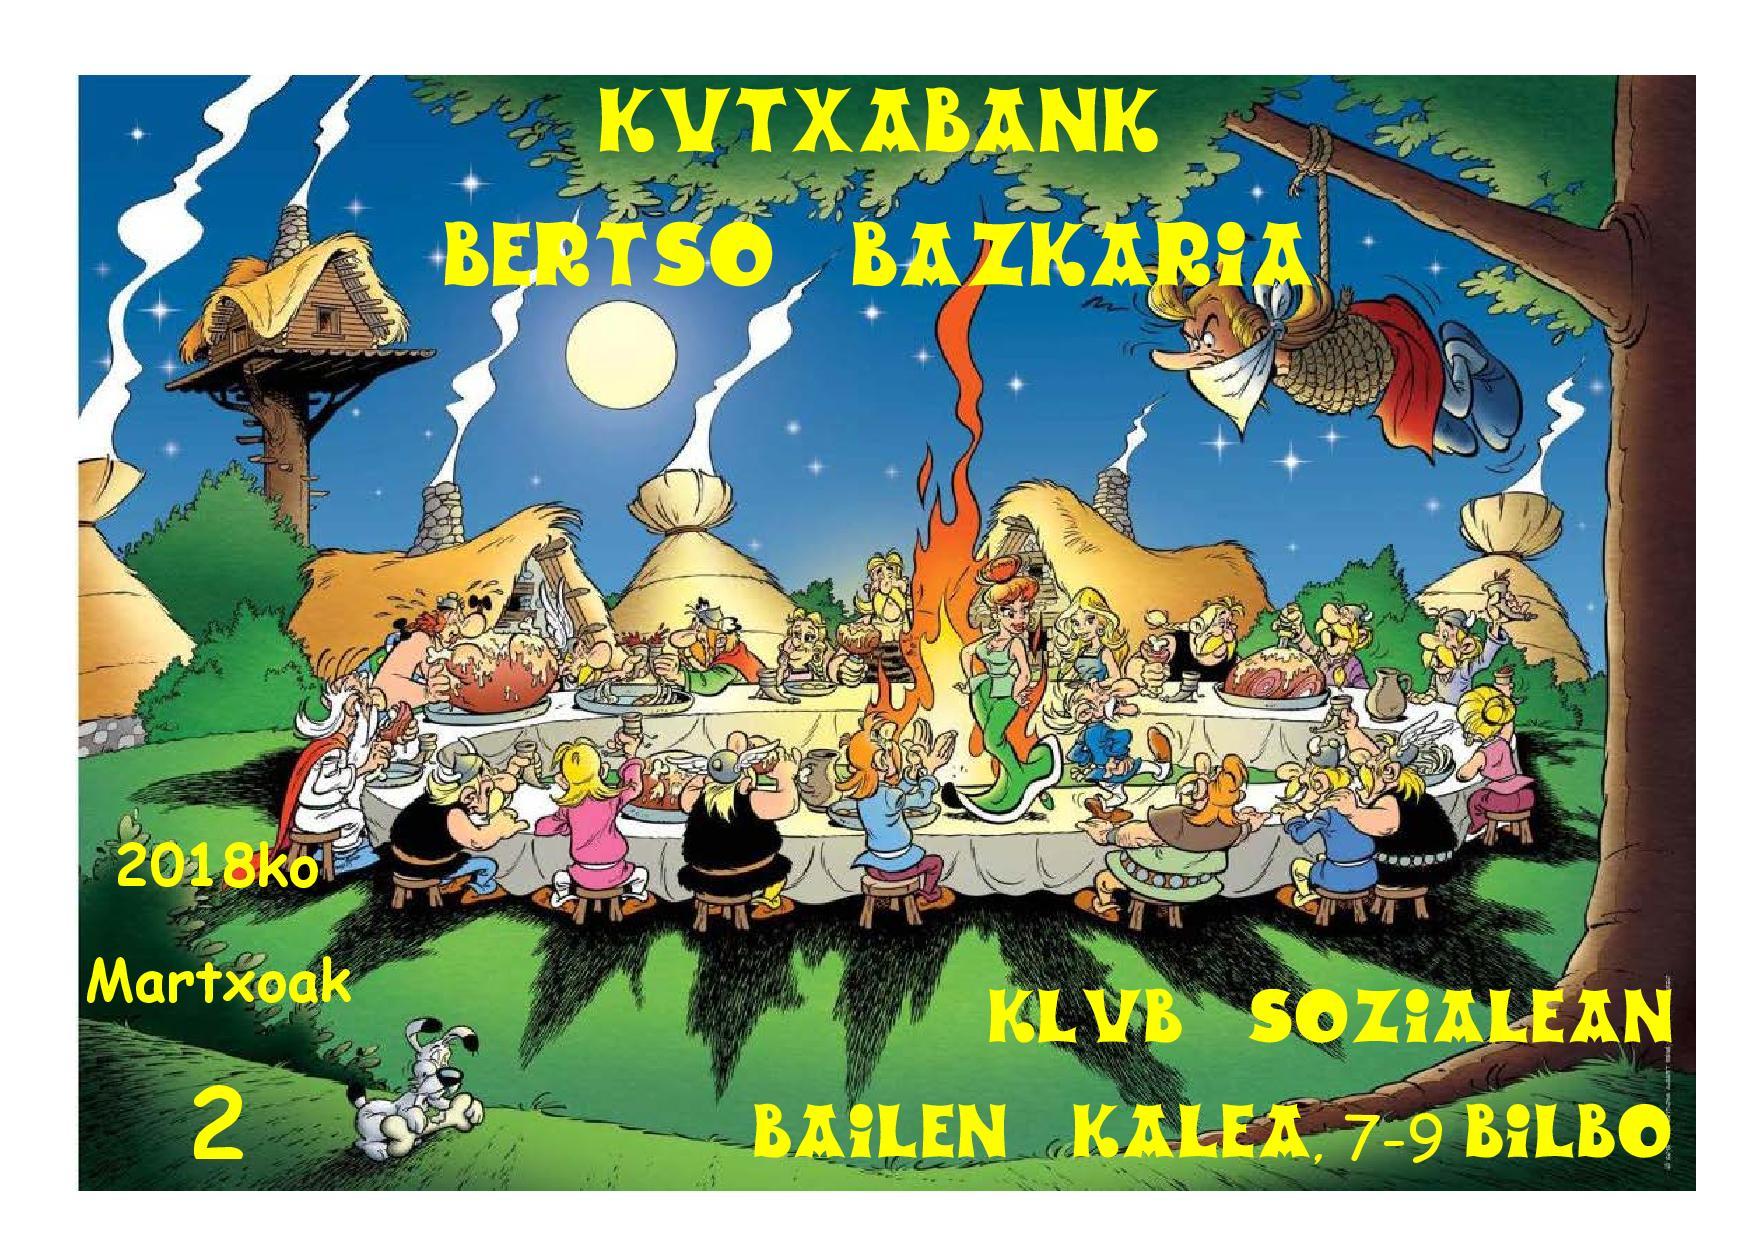 Bertso Bazkaria 2018 (Bilbo)